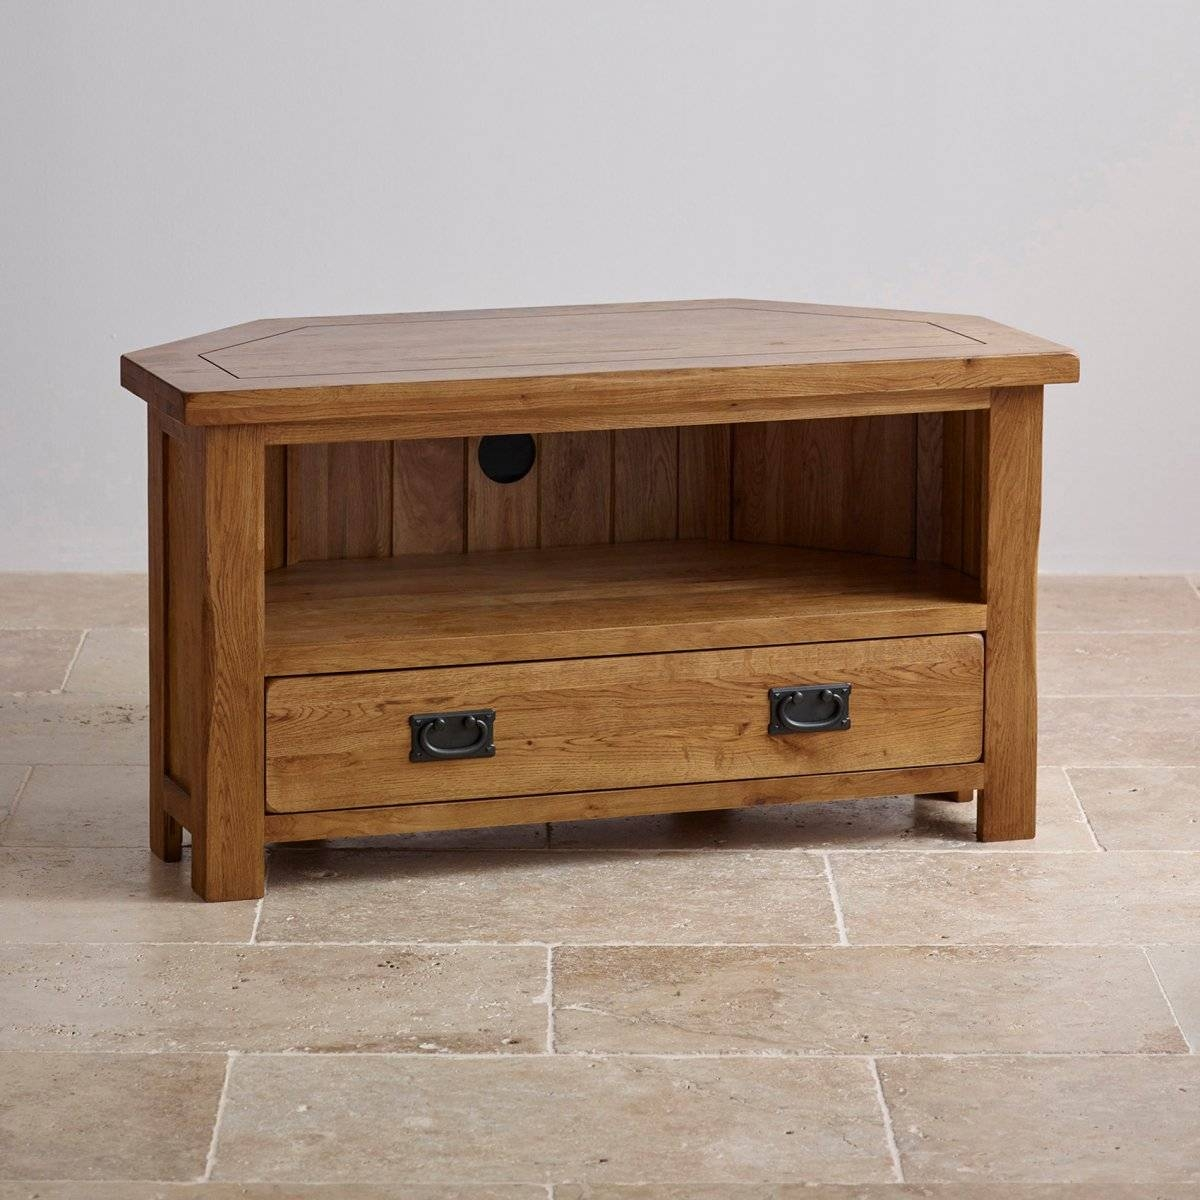 Original Rustic Corner Tv Cabinet In Solid Oak intended for Solid Oak Corner Tv Cabinets (Image 13 of 15)